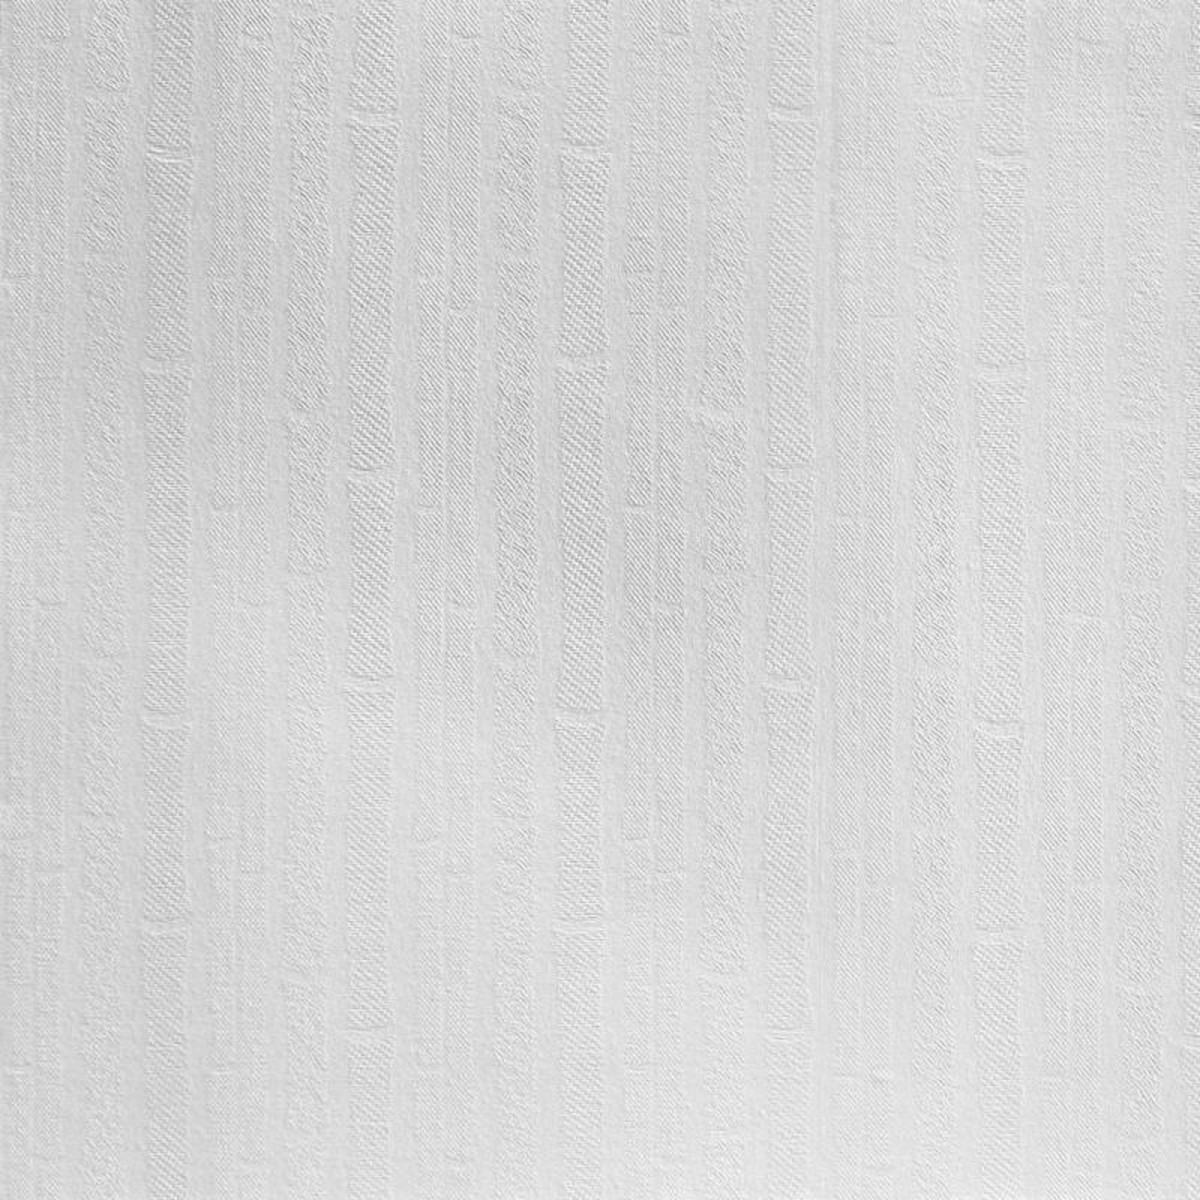 Стеклообои Тростник Wellton Decor  1 х 12 5 м WD801